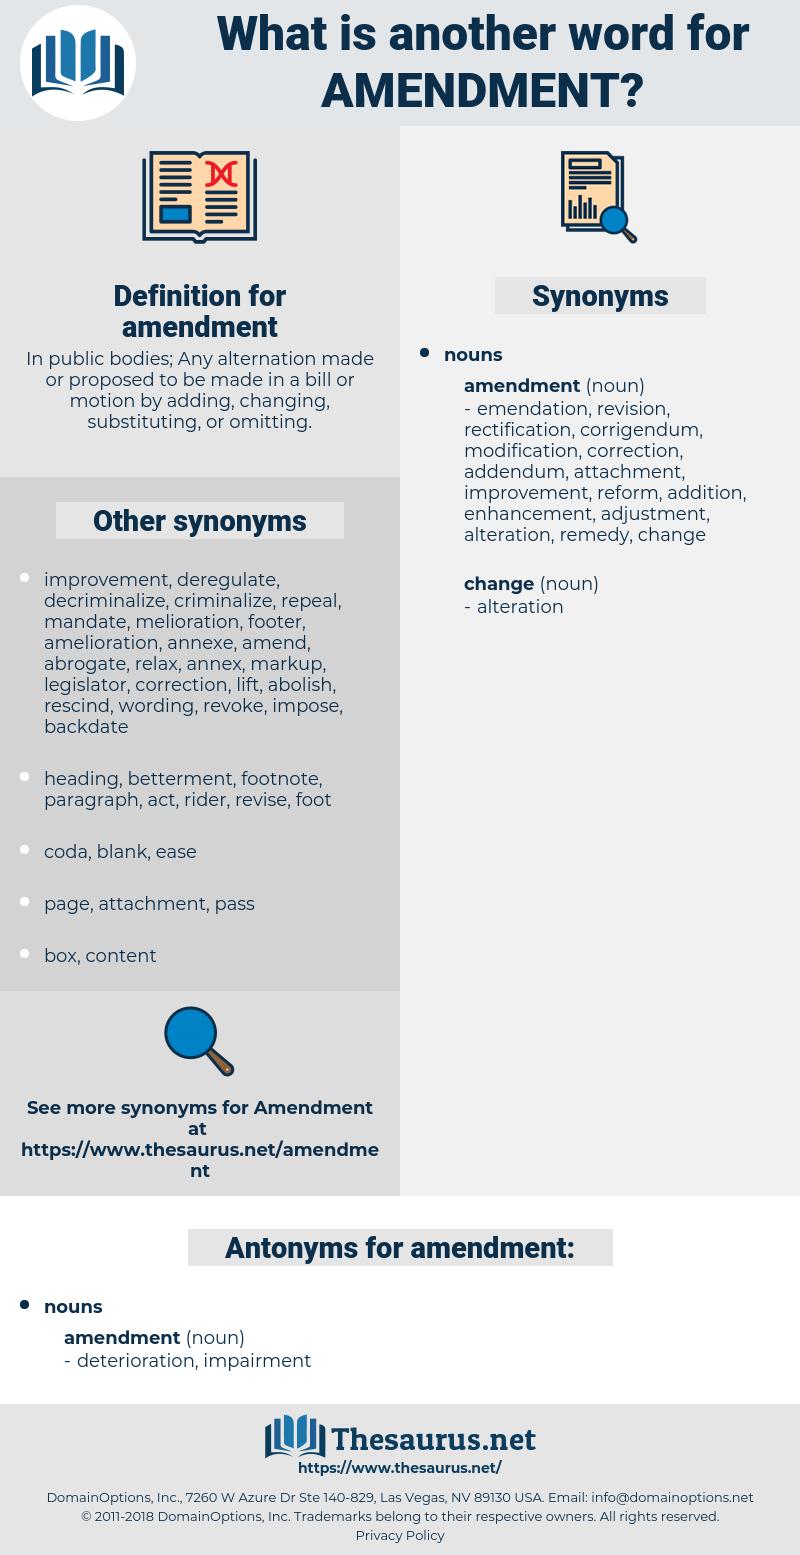 Synonyms for AMENDMENT, Antonyms for AMENDMENT - Thesaurus net